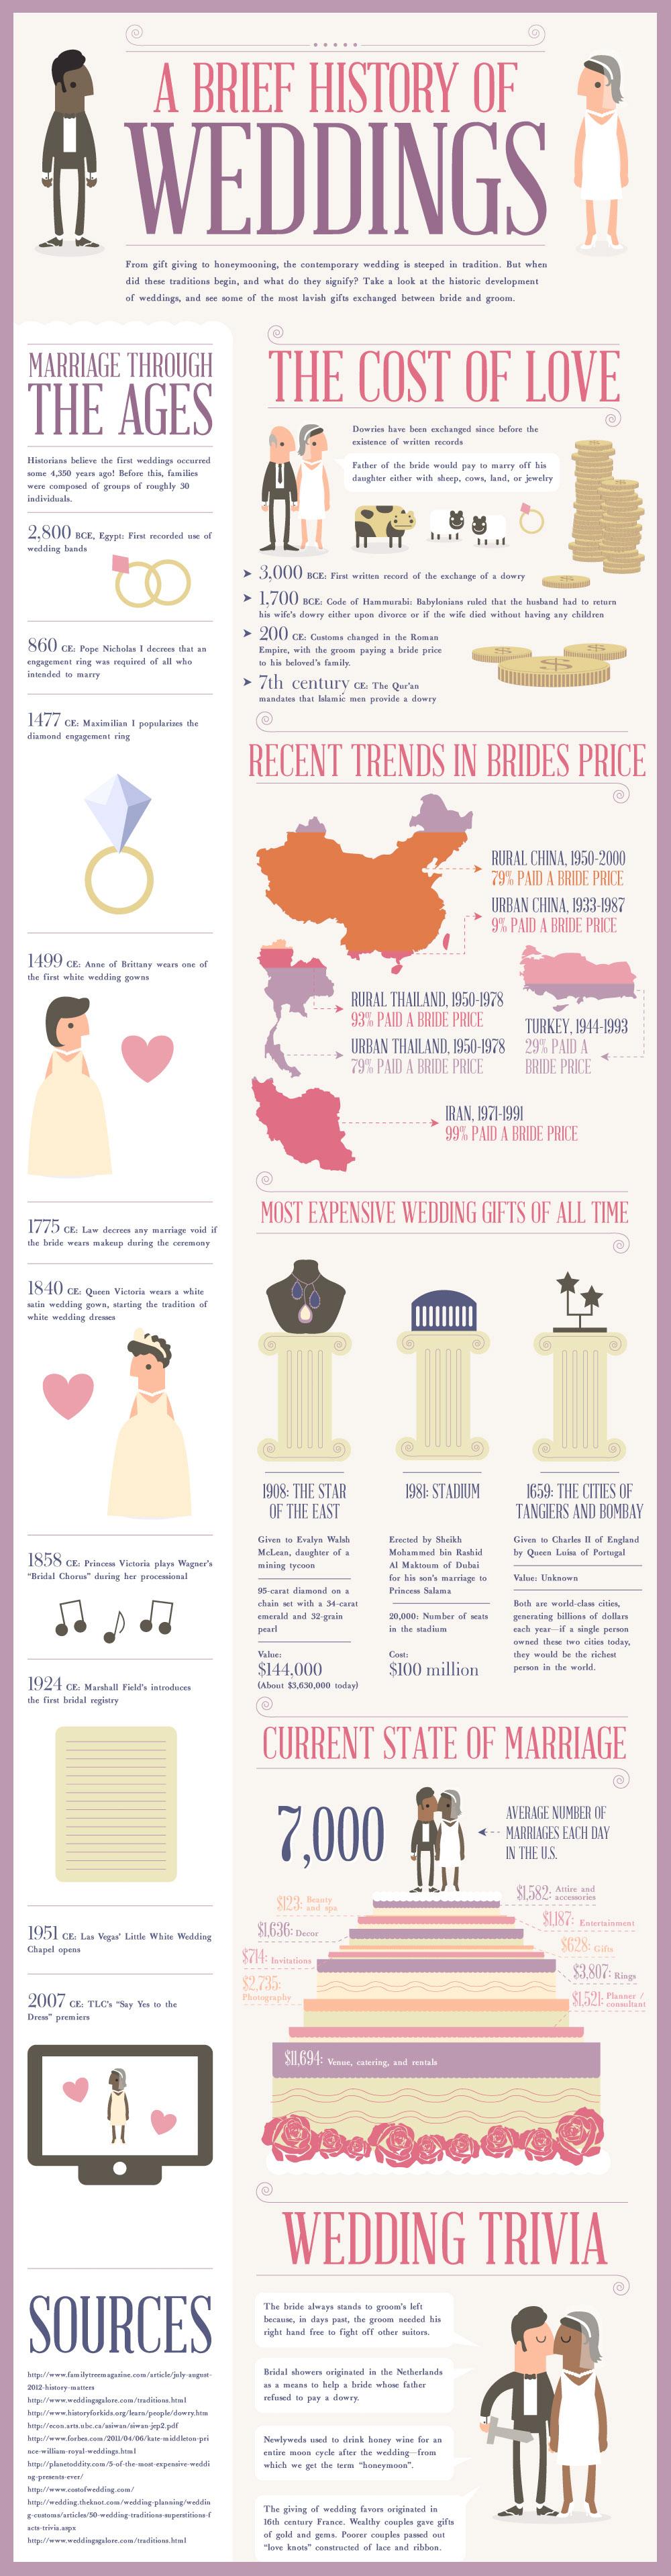 Weddings EtiquetteiNFOGRAPHiCs MANiA